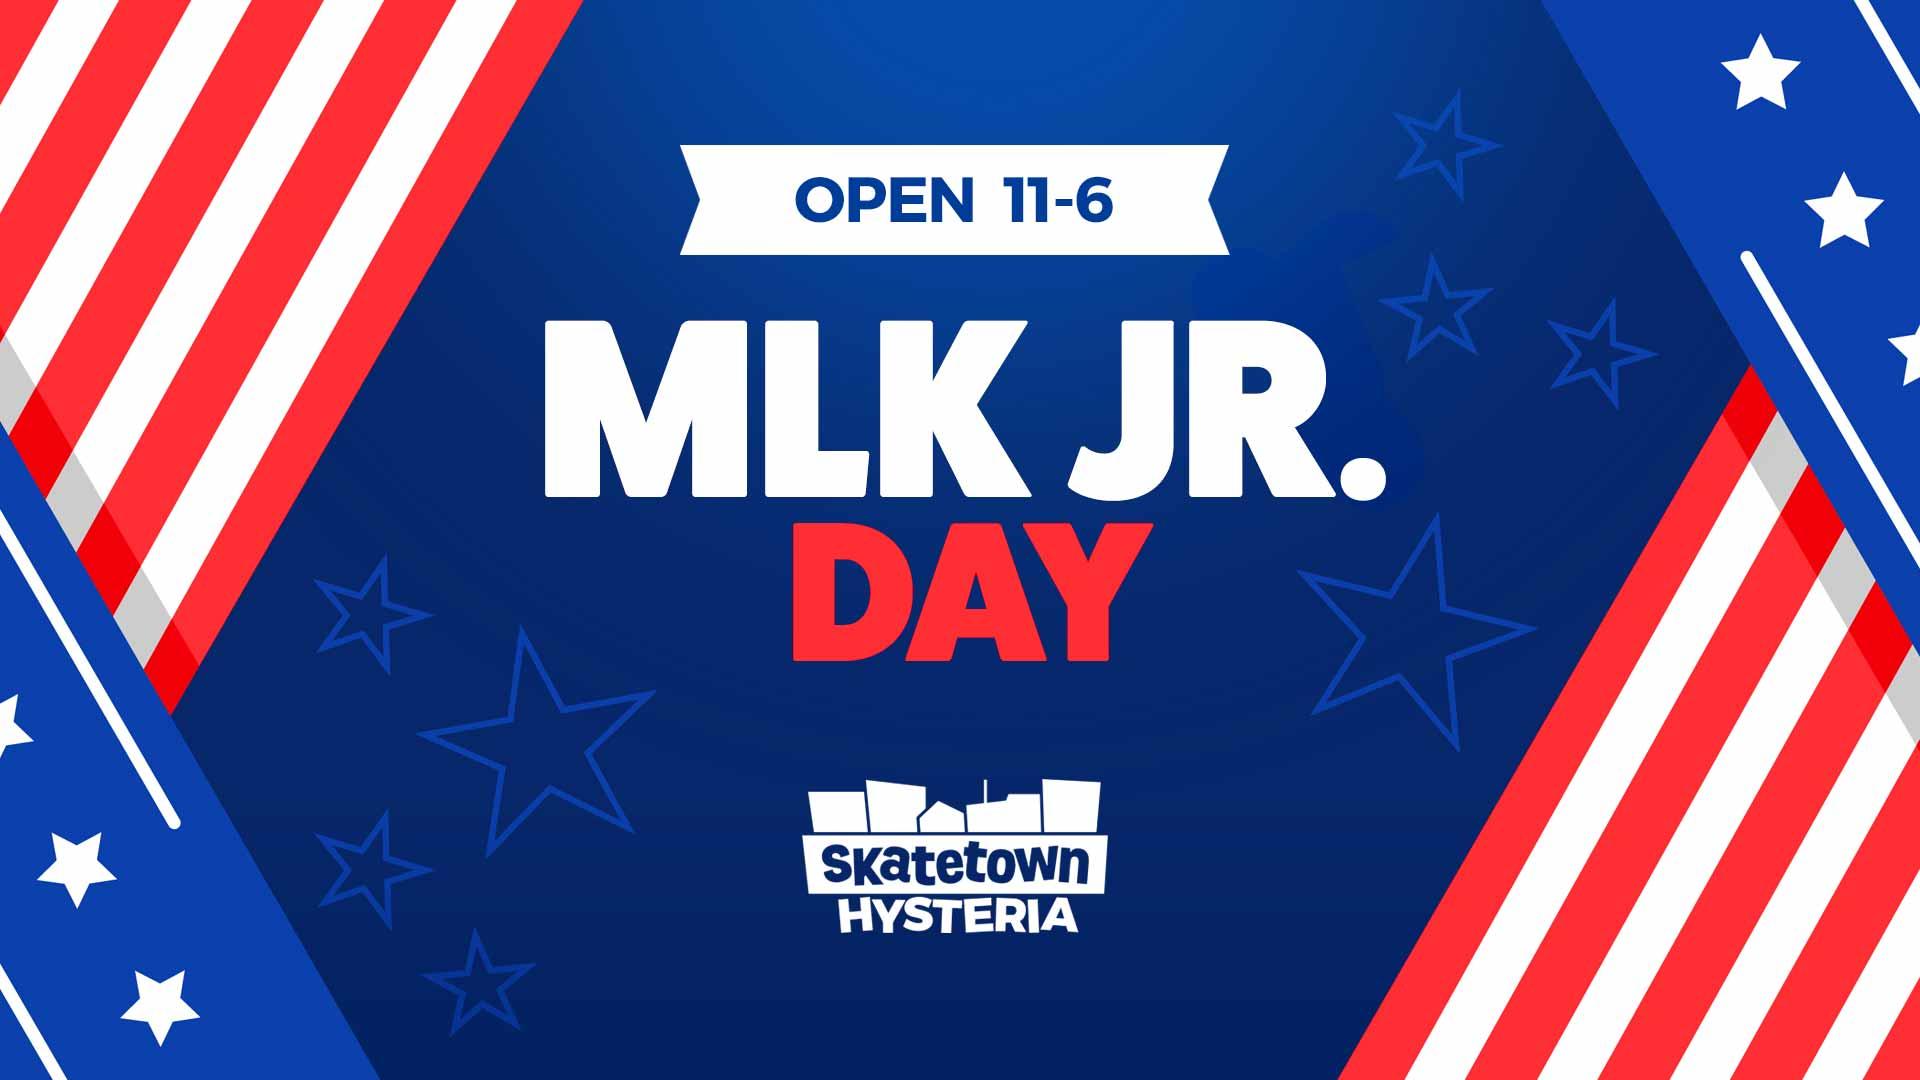 MLK Jr. Day 2020 event at Skatetown Hysteria